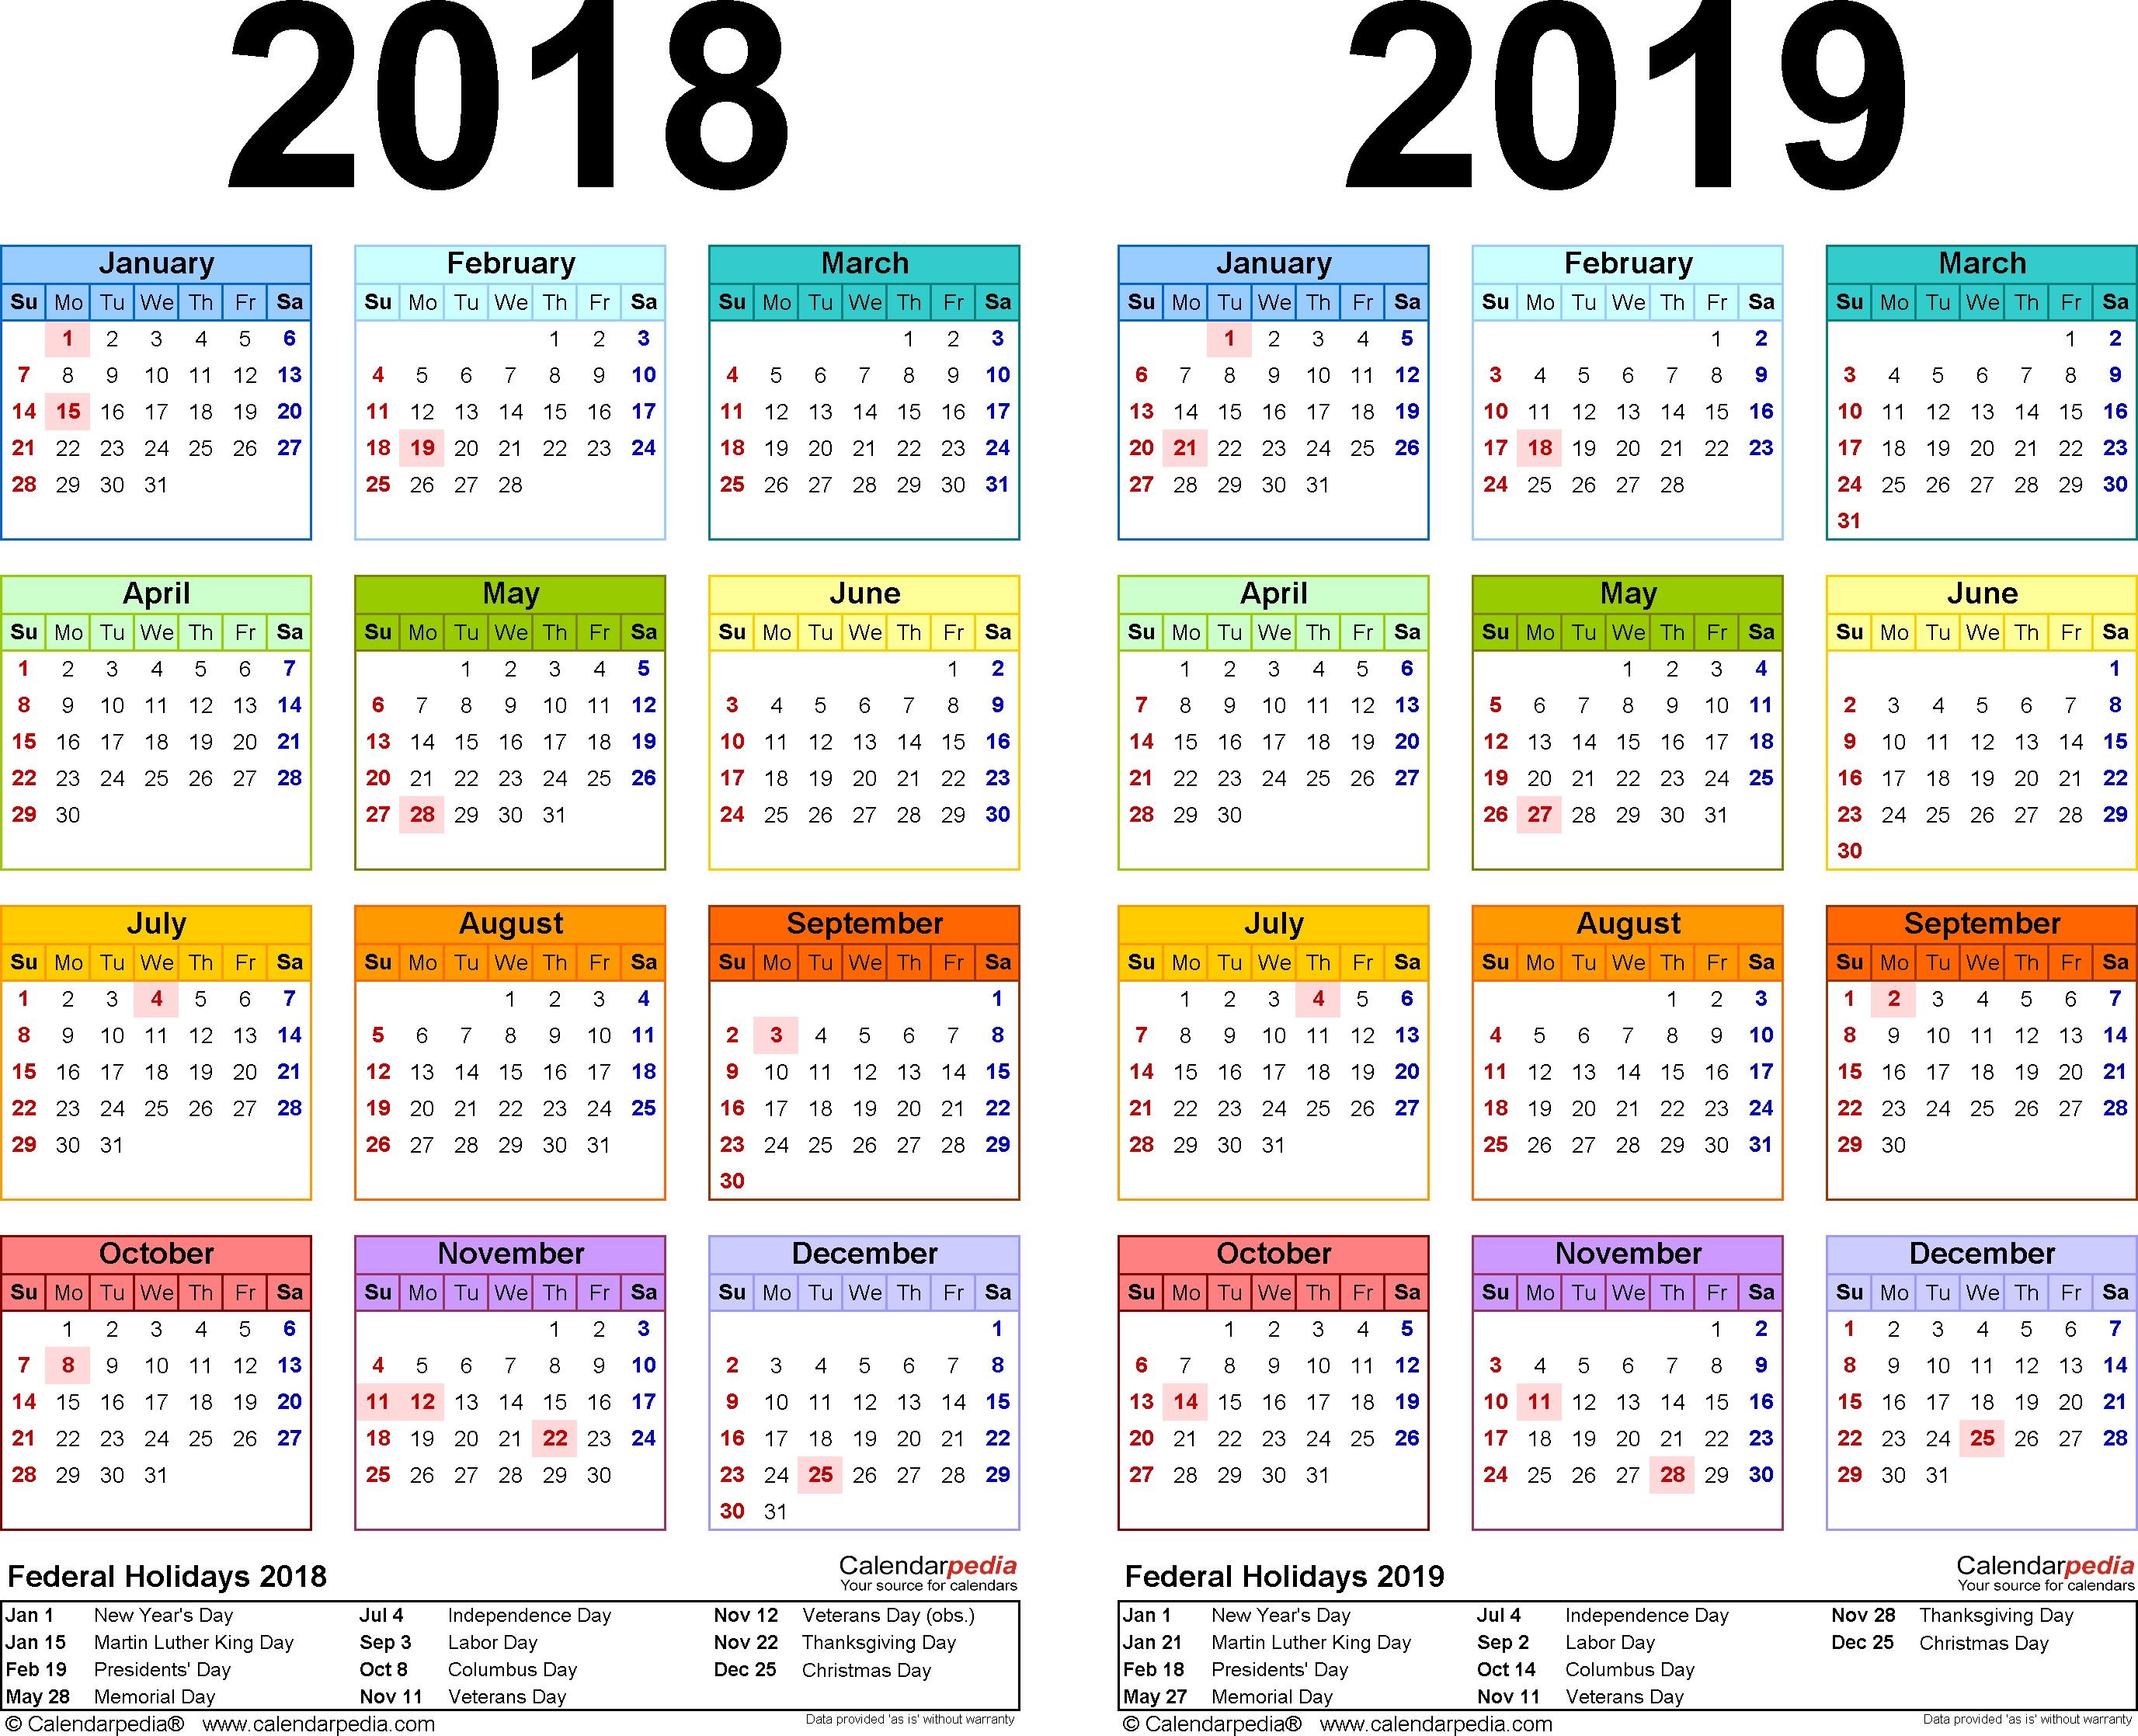 2018-2019 Calendar - Free Printable Two-Year Pdf Calendars in 2019-2020 Calendar Vertex